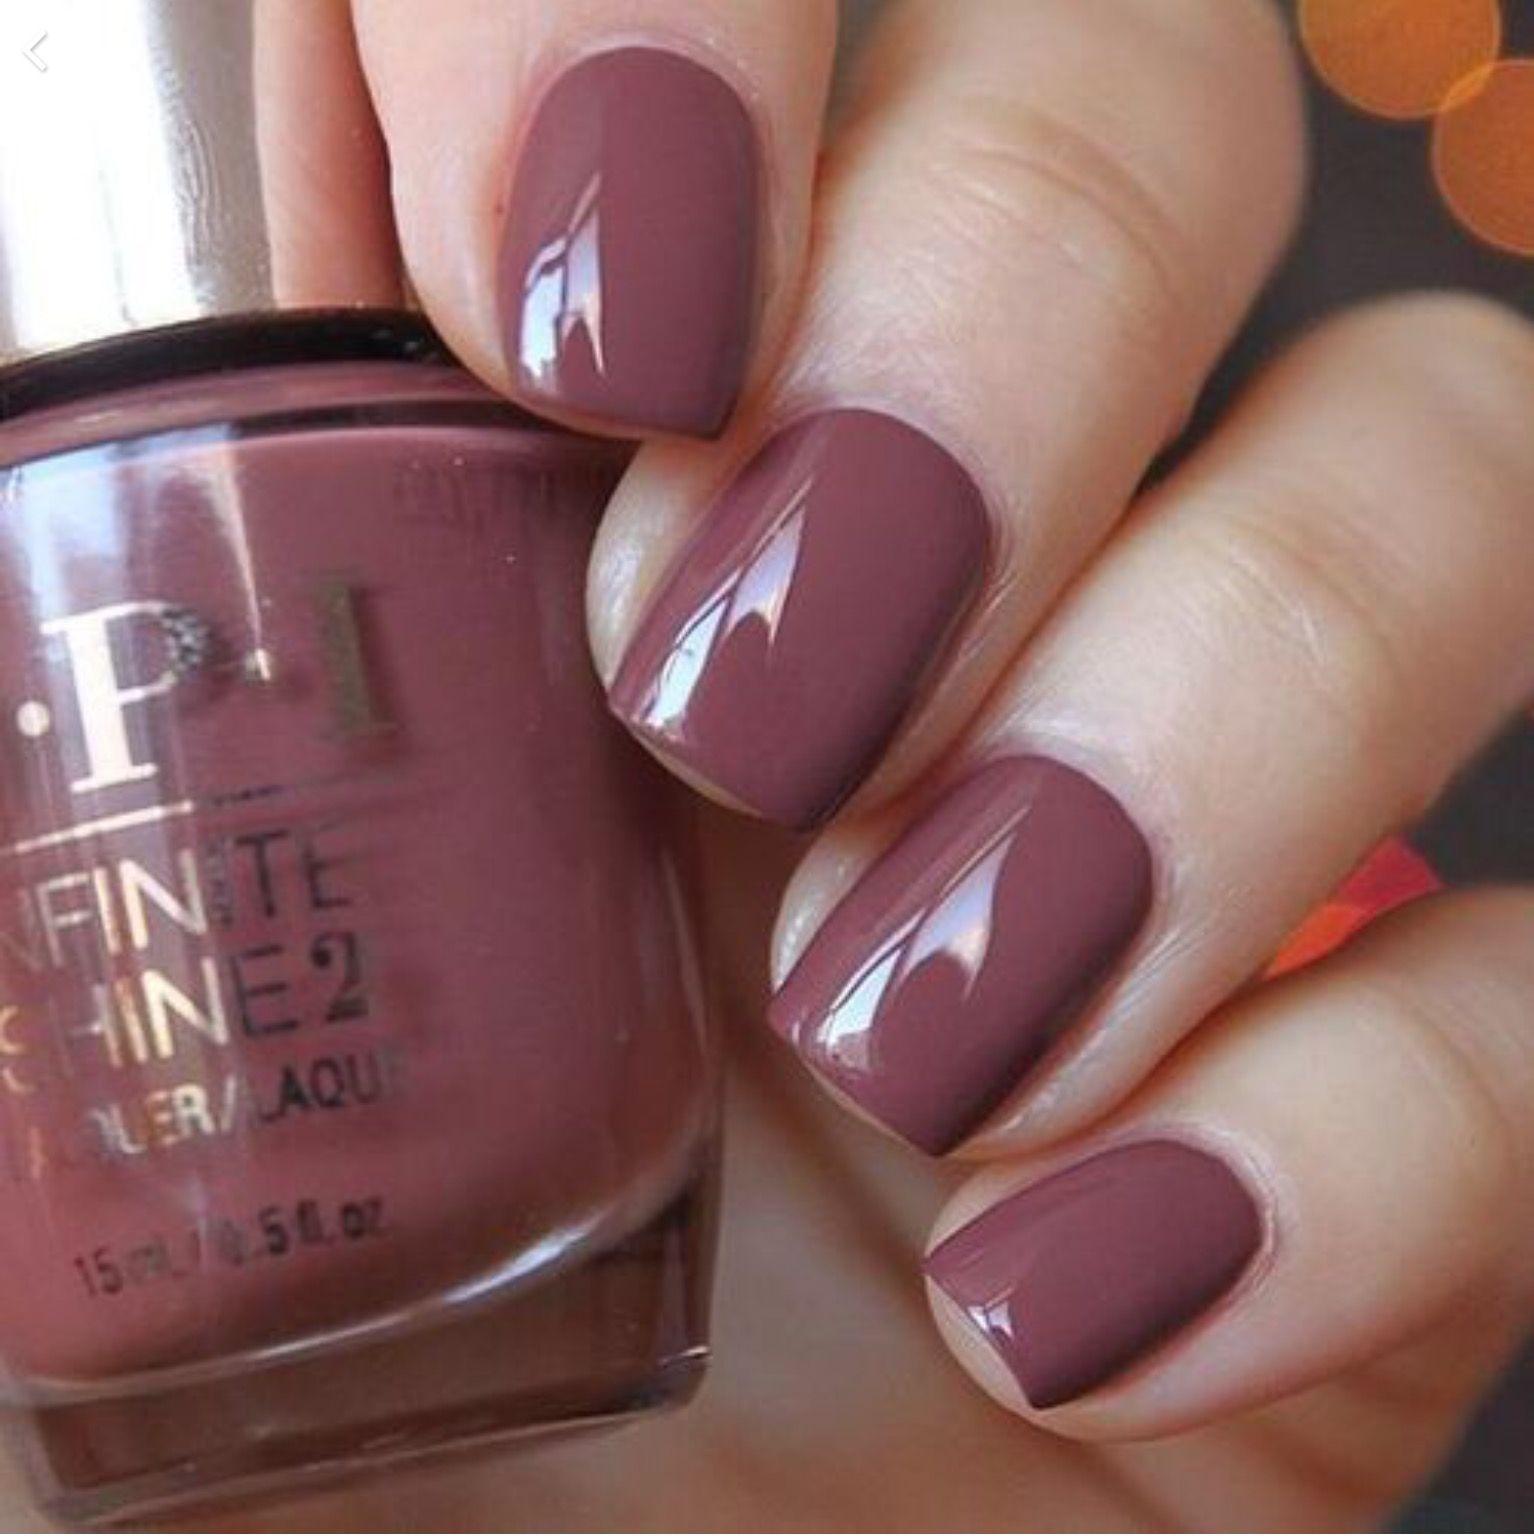 OPI Infinite Shine Linger Over Coffee | | nails | | Pinterest ...